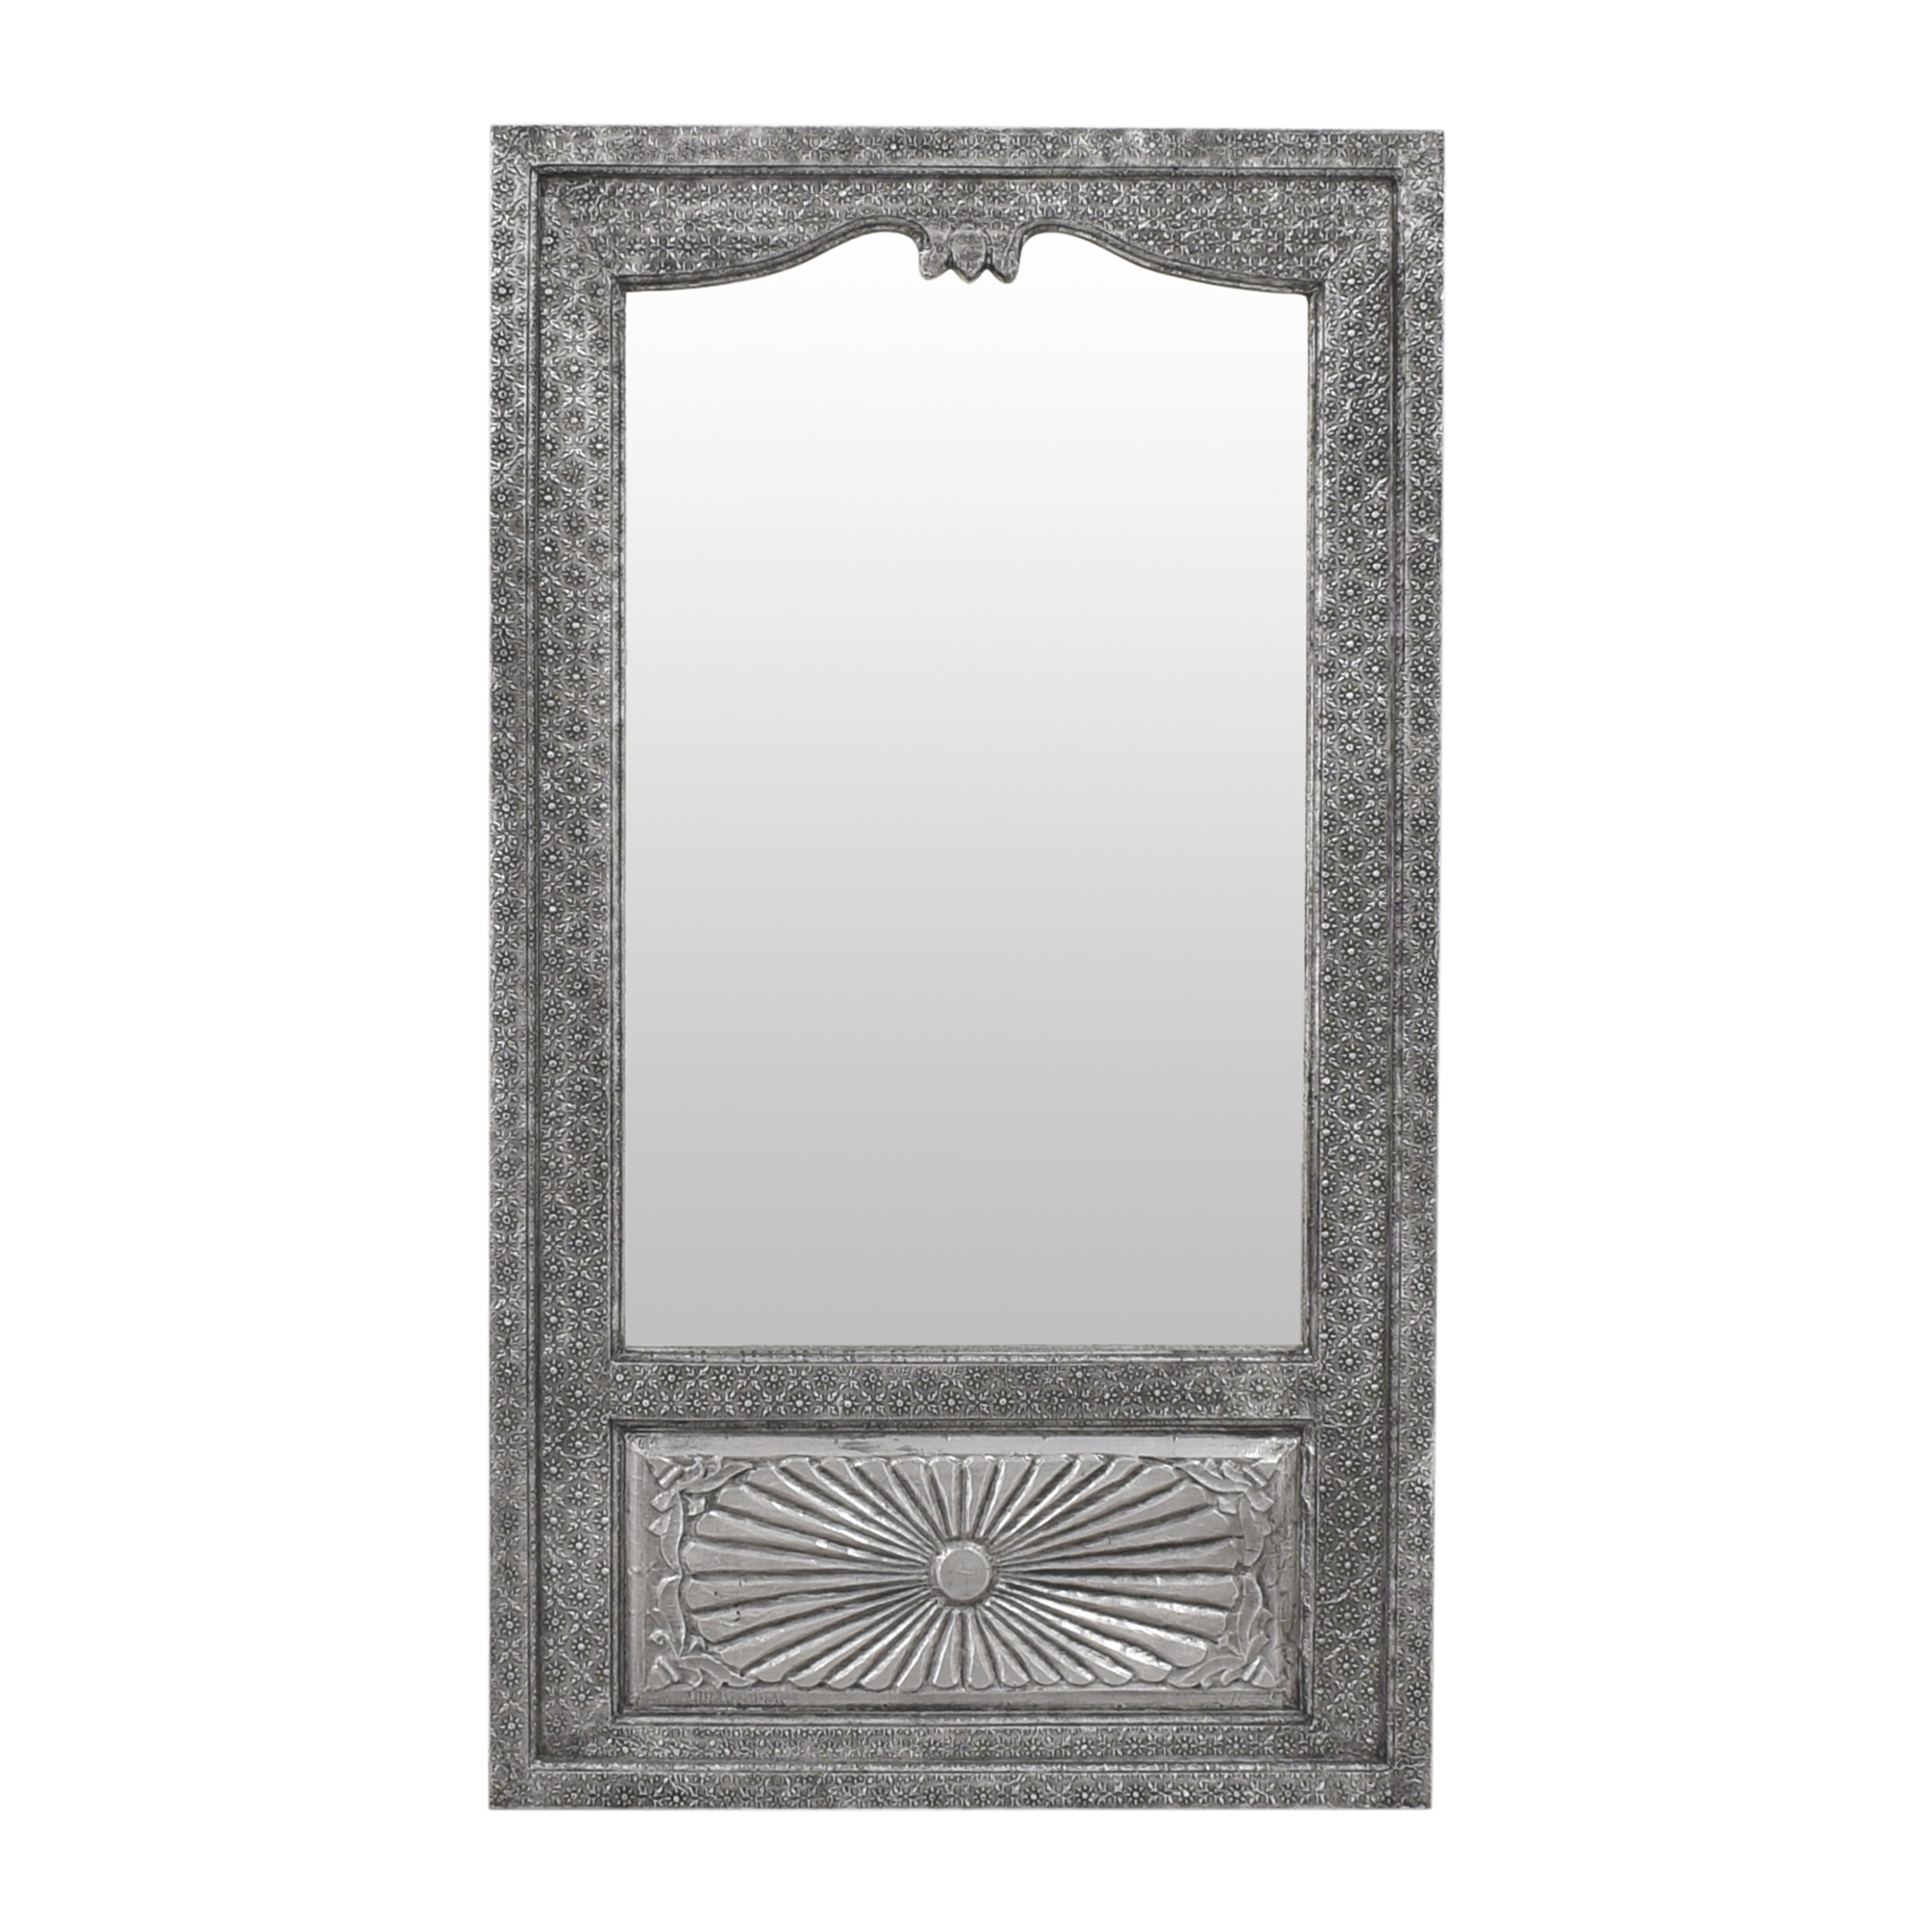 Arhaus Arhaus Moroccan-Style Wall Mirror silver